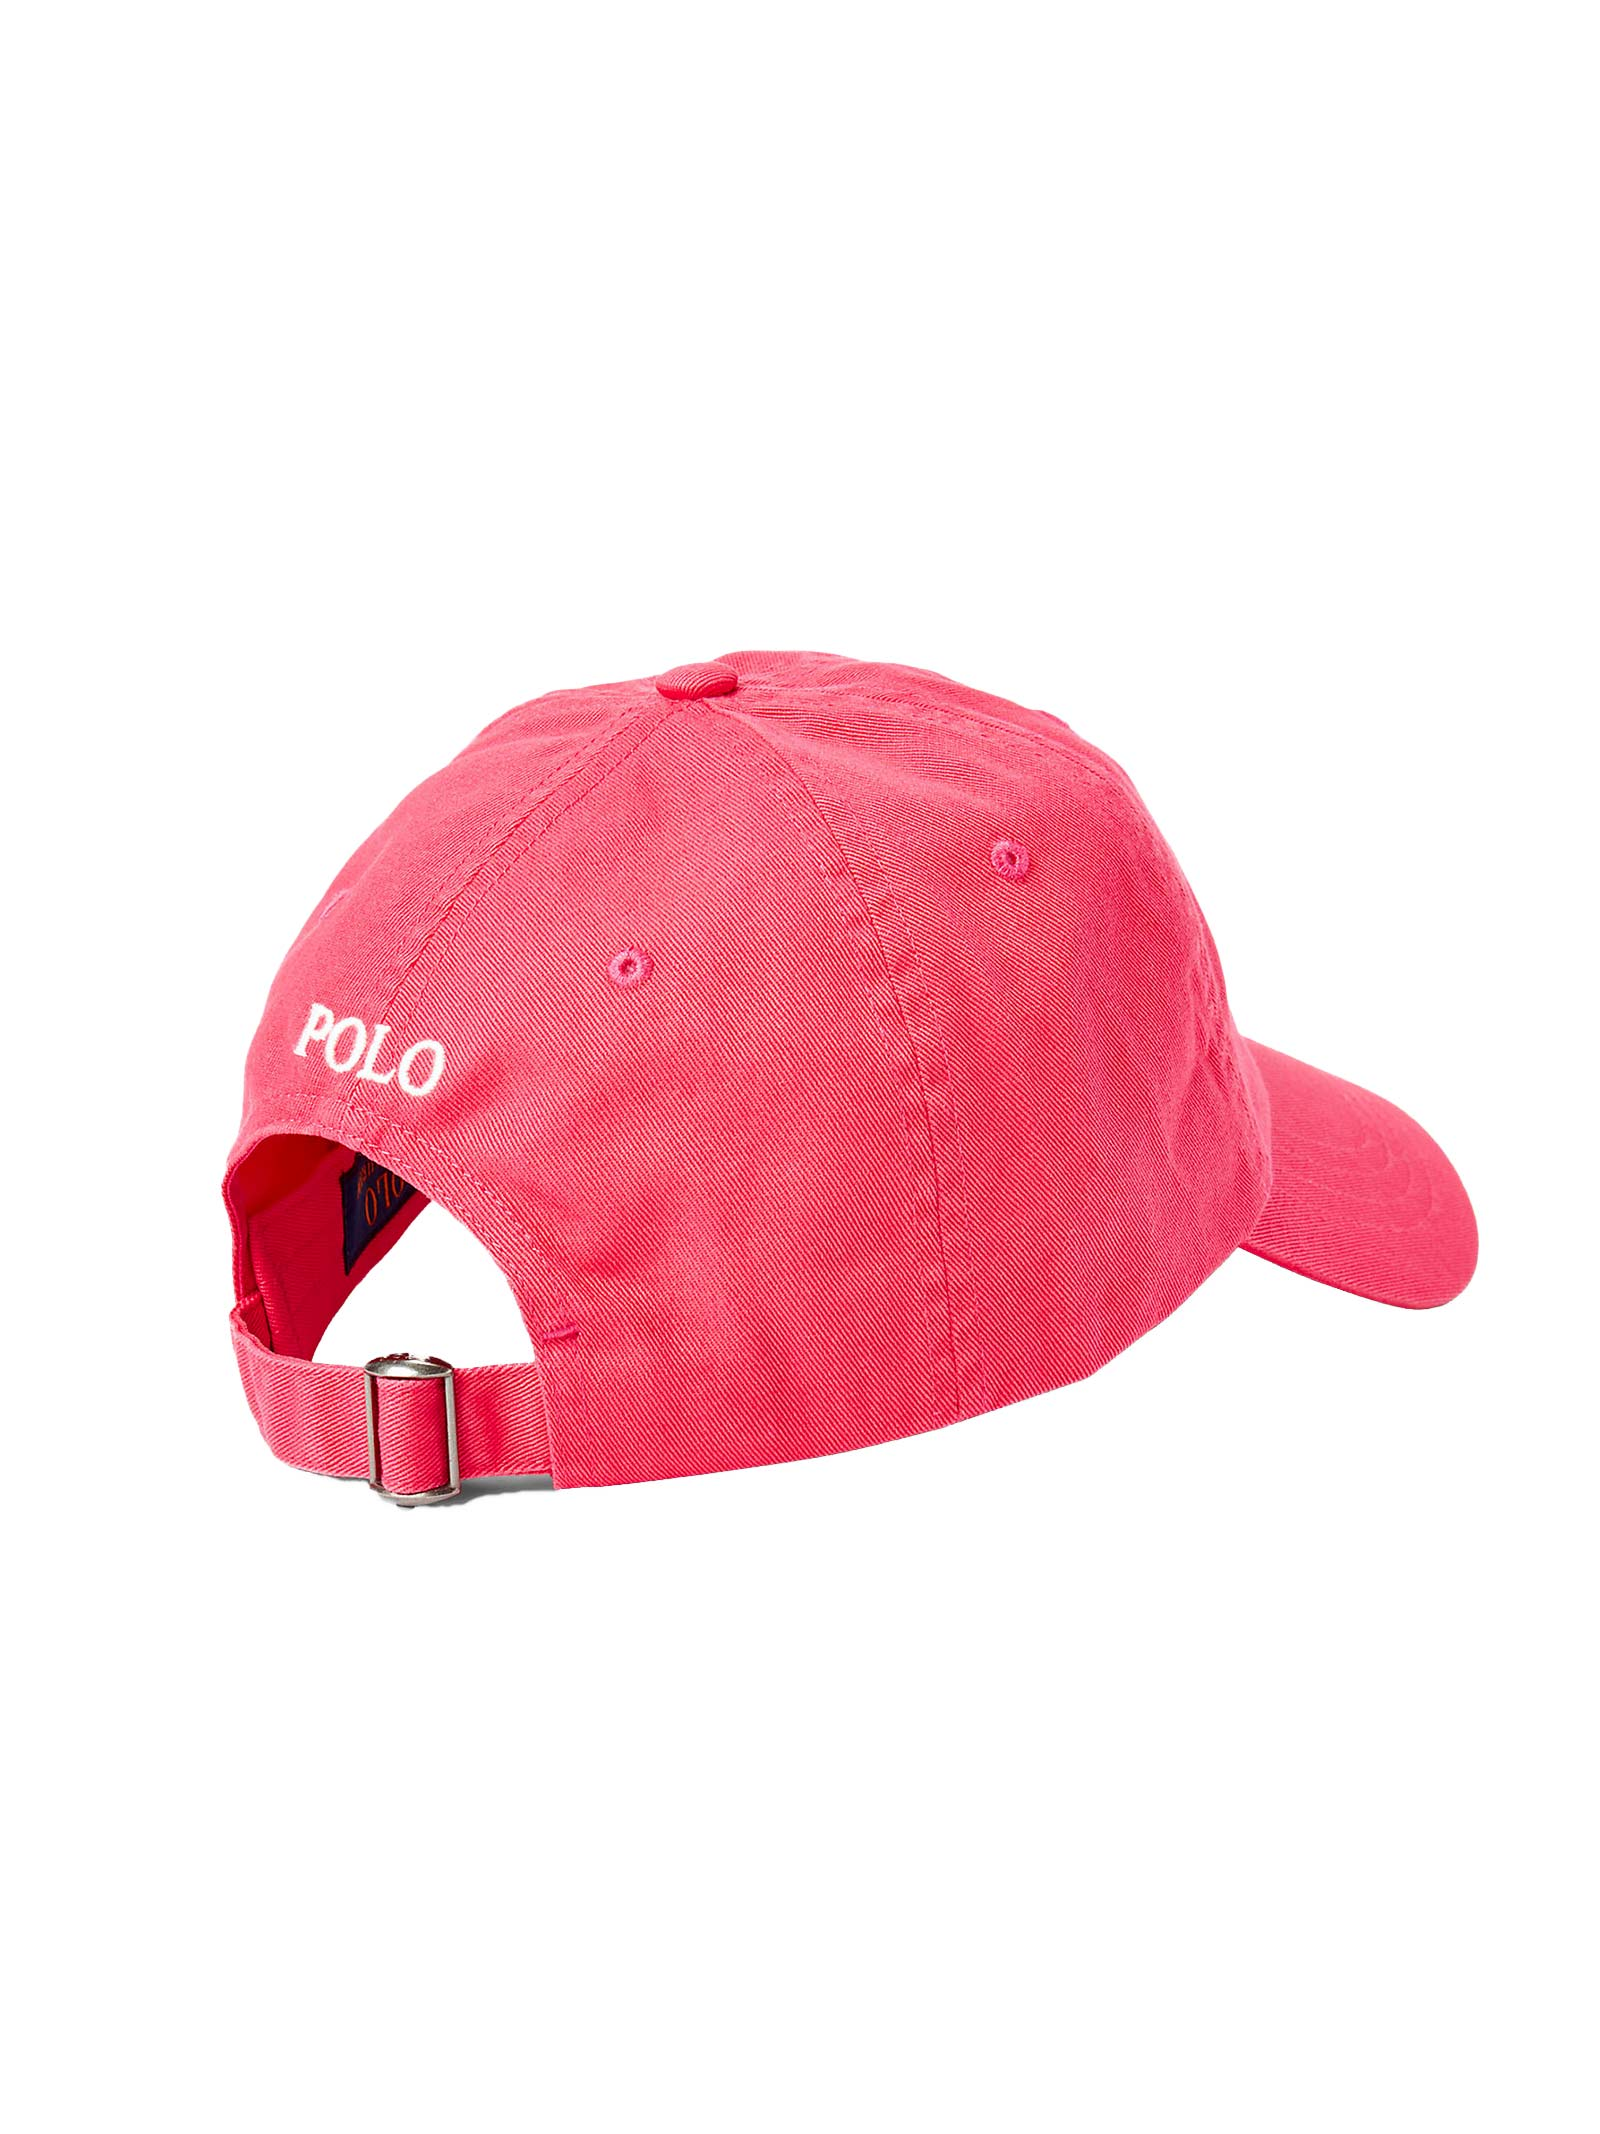 Cappello con visiera rosa RALPH LAUREN | Cappello | 710-811338004